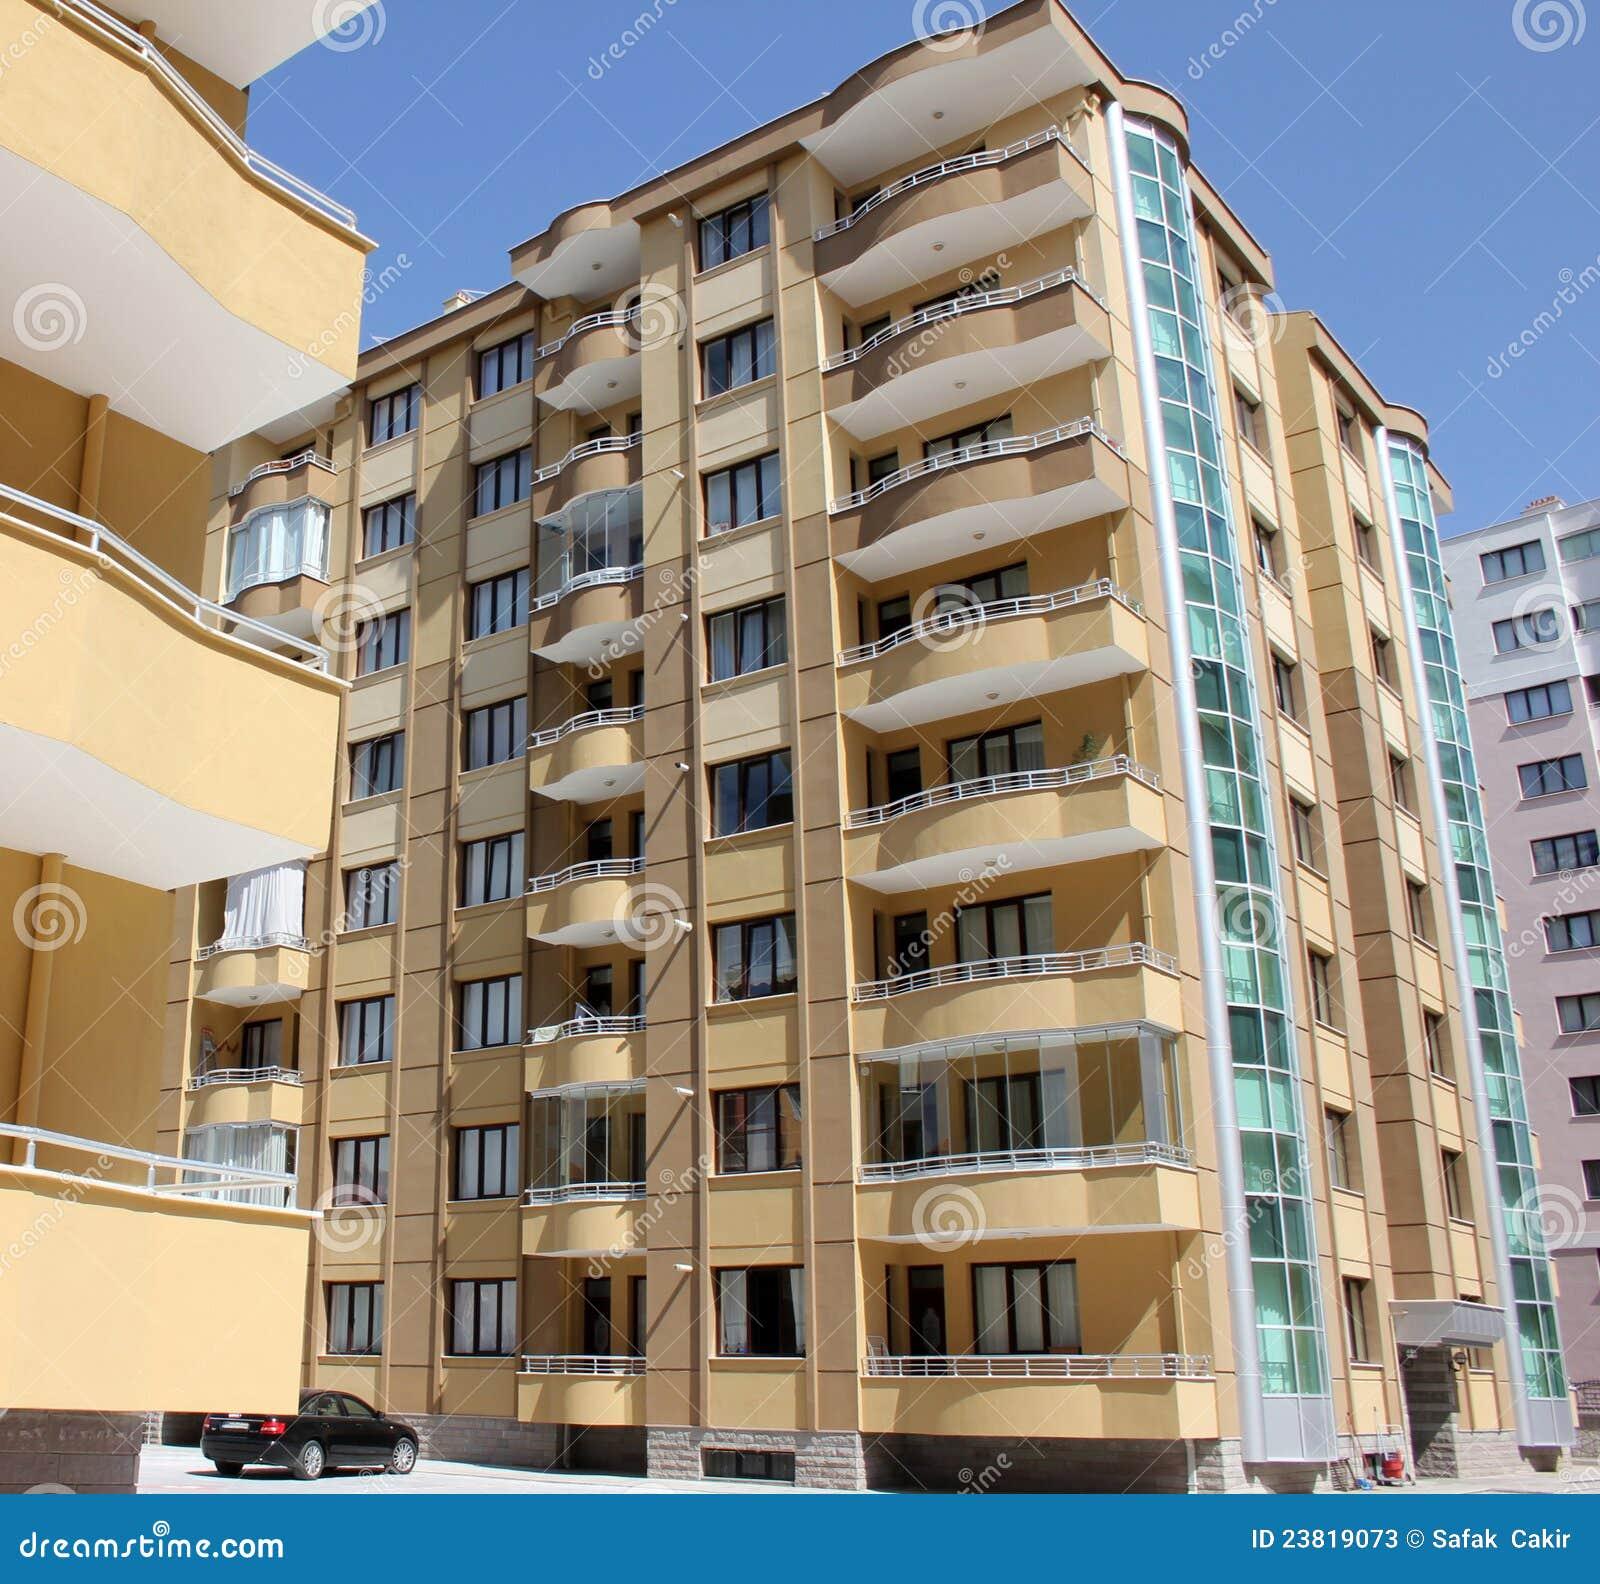 Apartment Block: Apartment Block Stock Image. Image Of Construct, Home